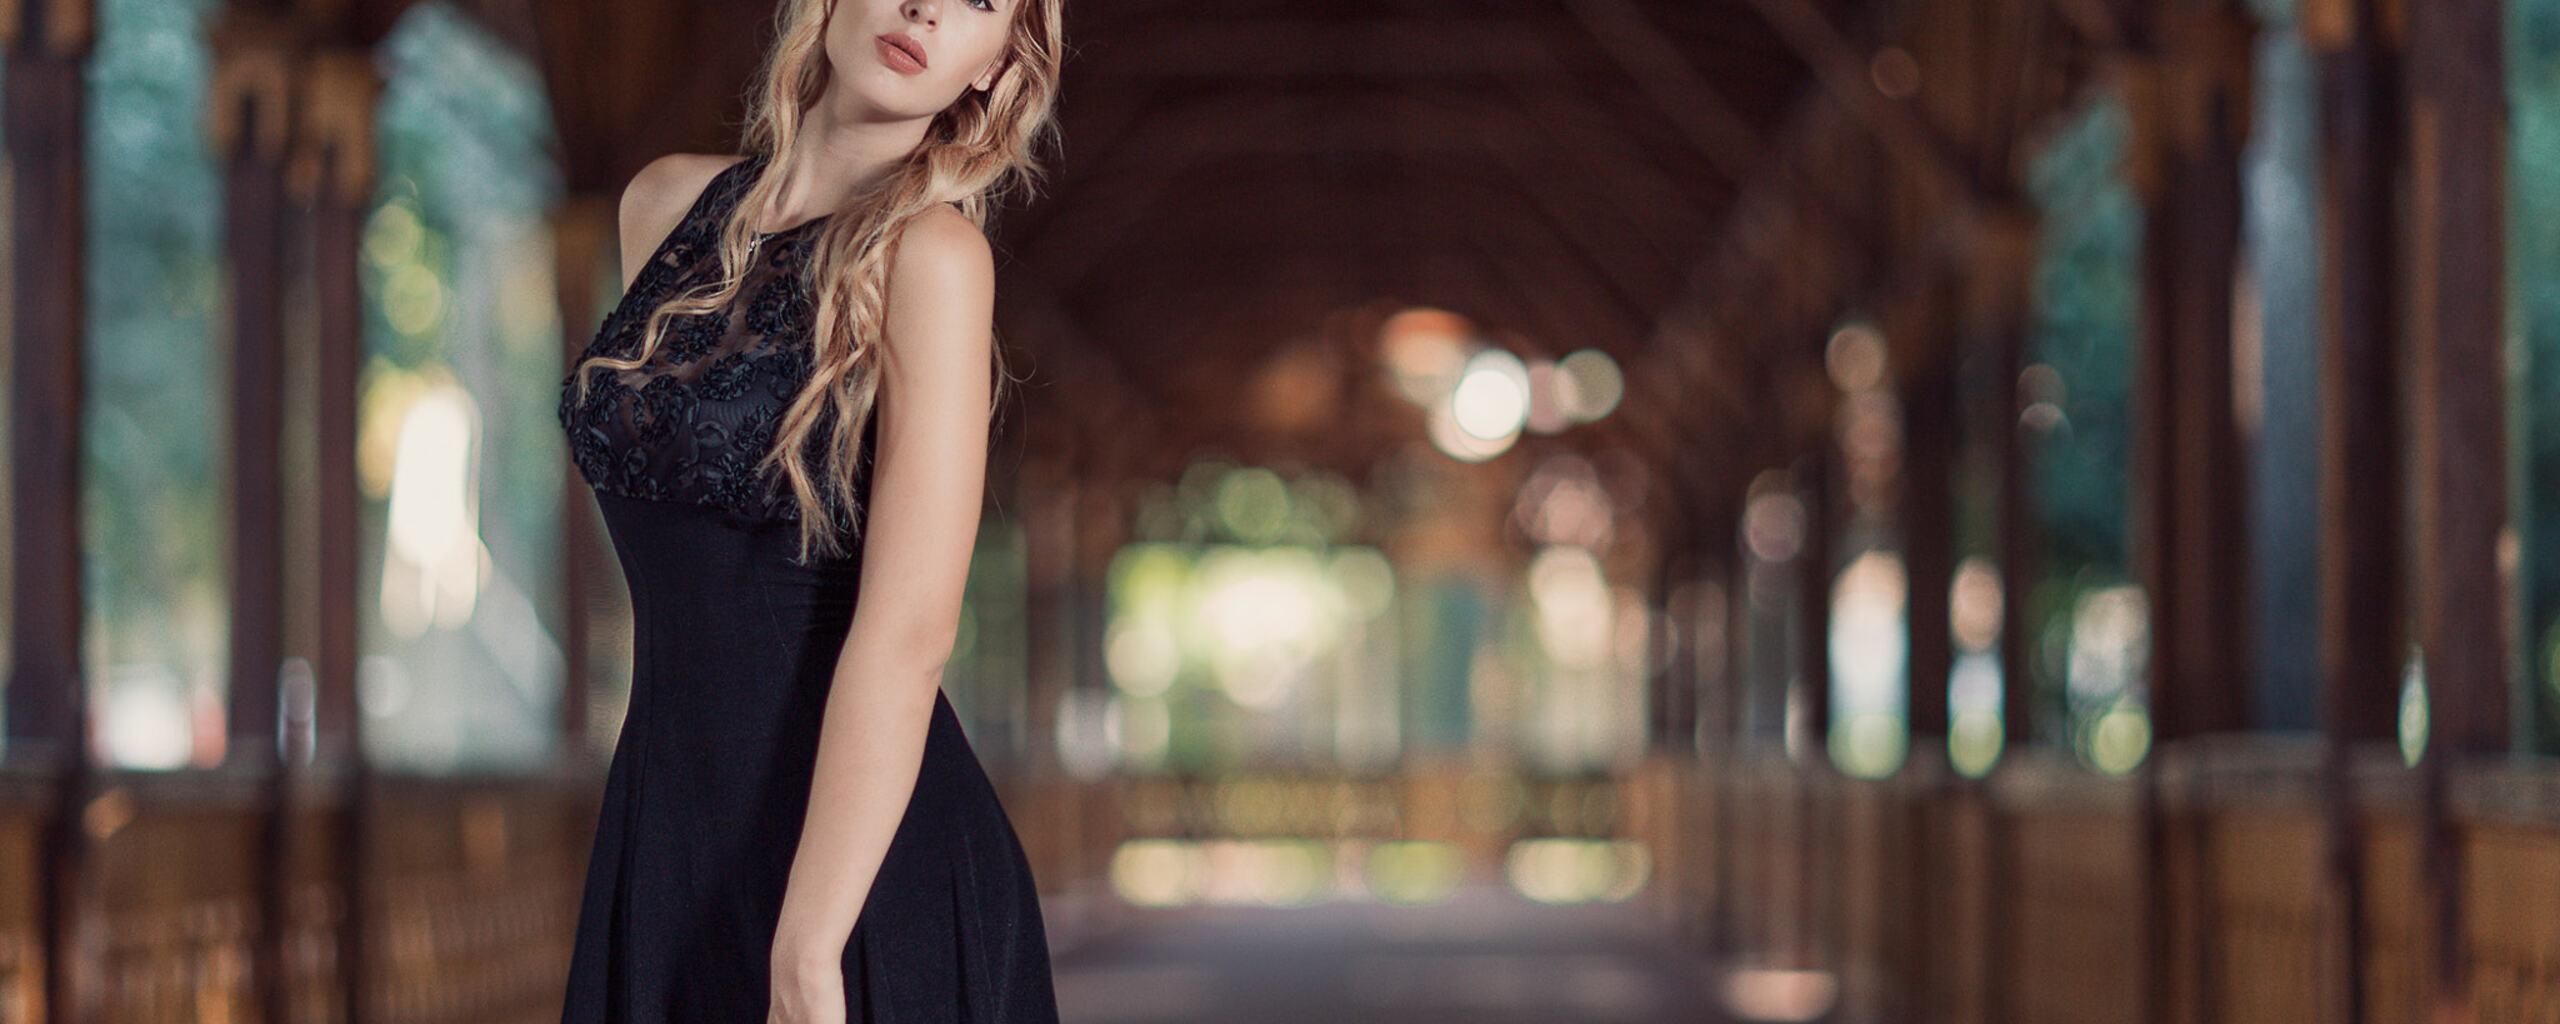 blonde-girl-in-black-dress-g5.jpg